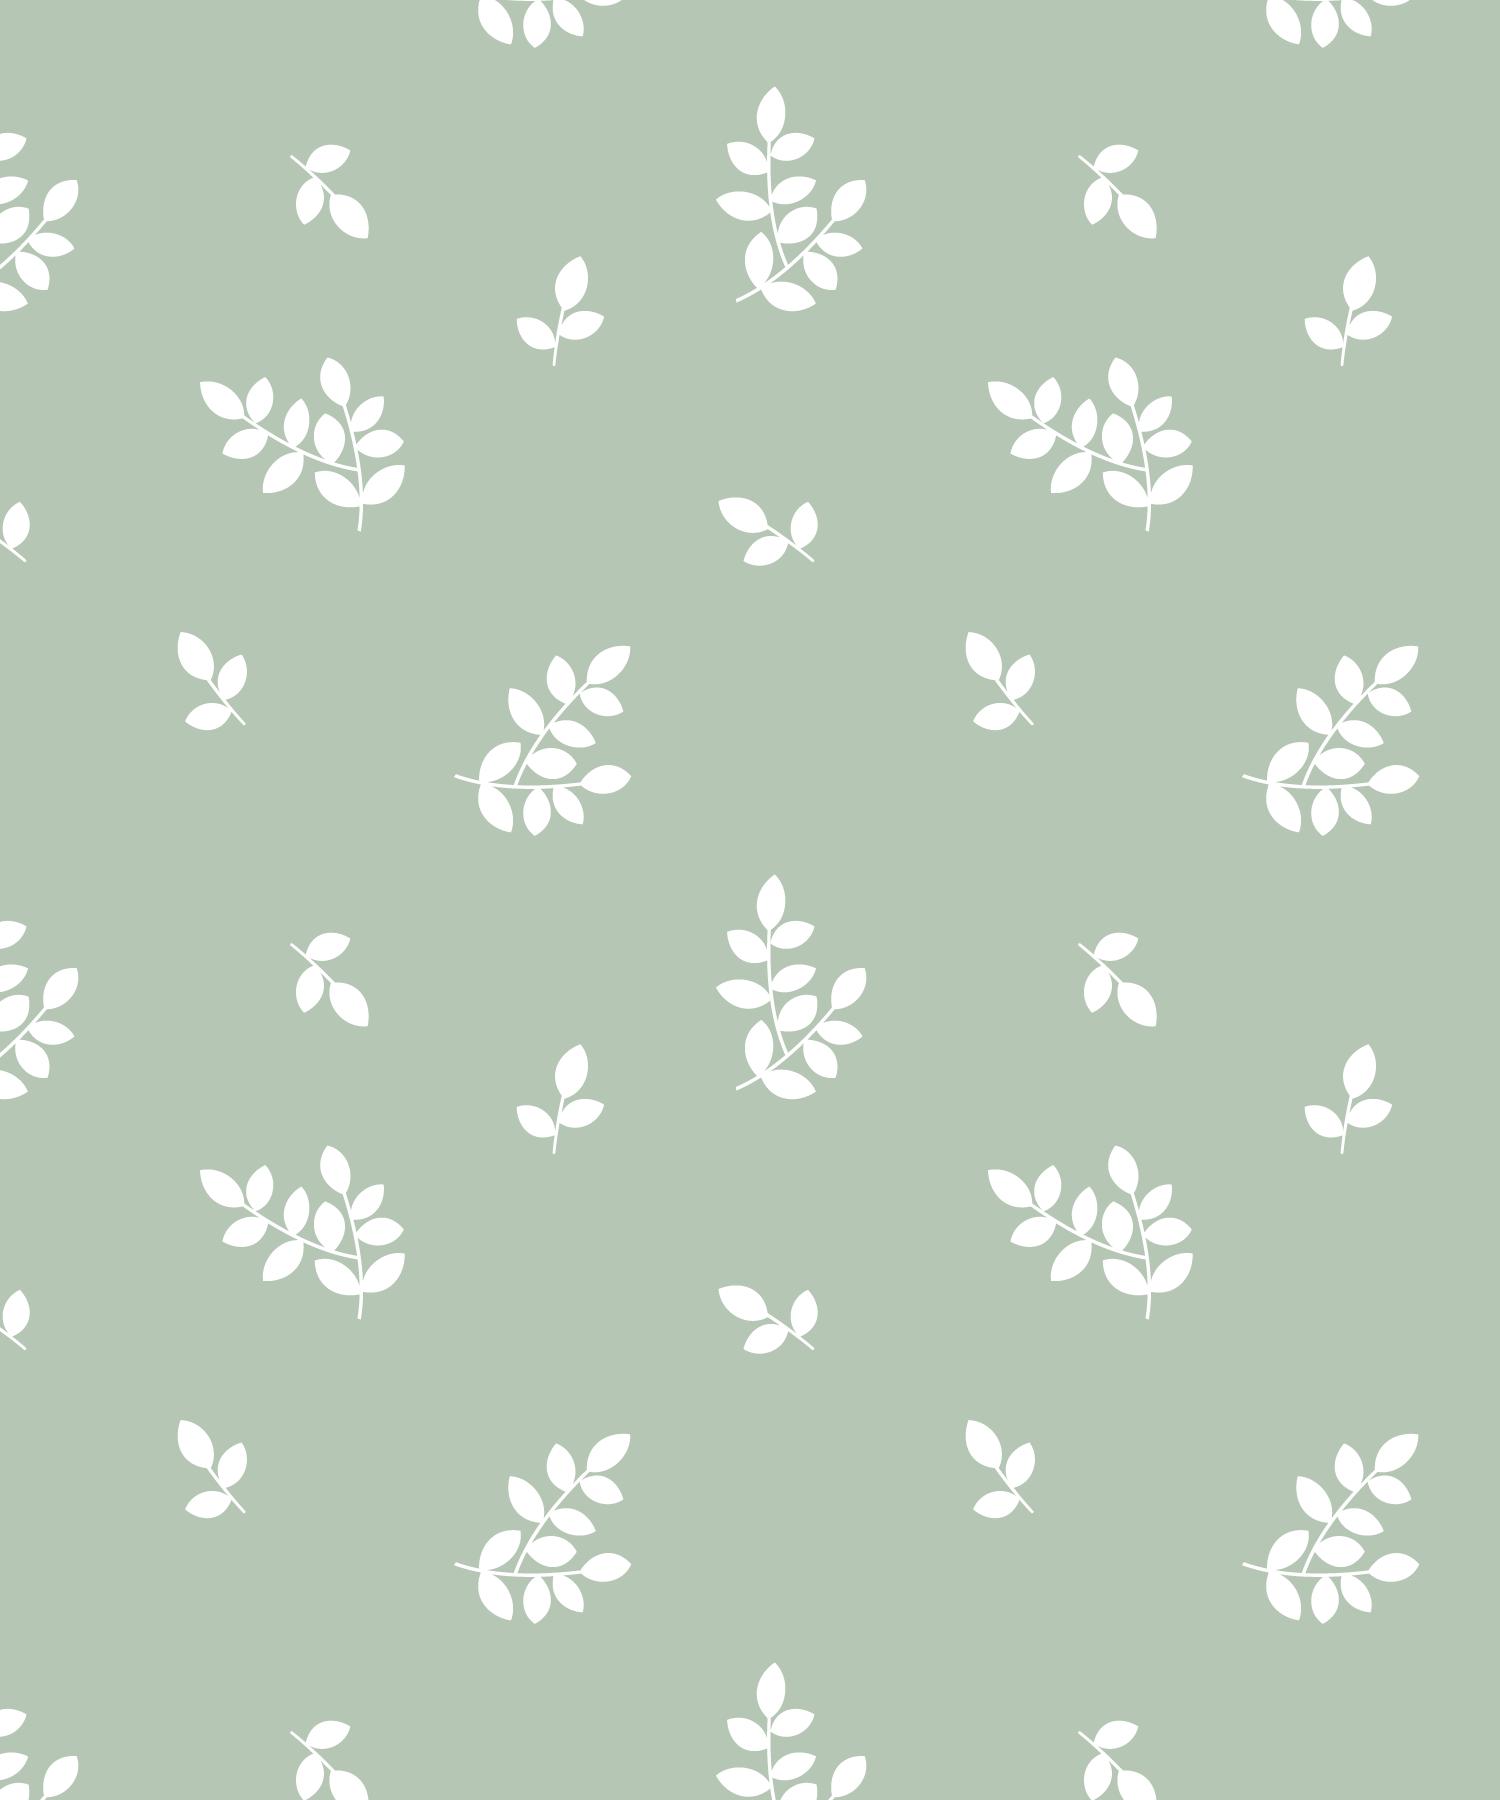 Ivory Bell Floral Logo & Branding by Bea & Bloom Creative Design Studio